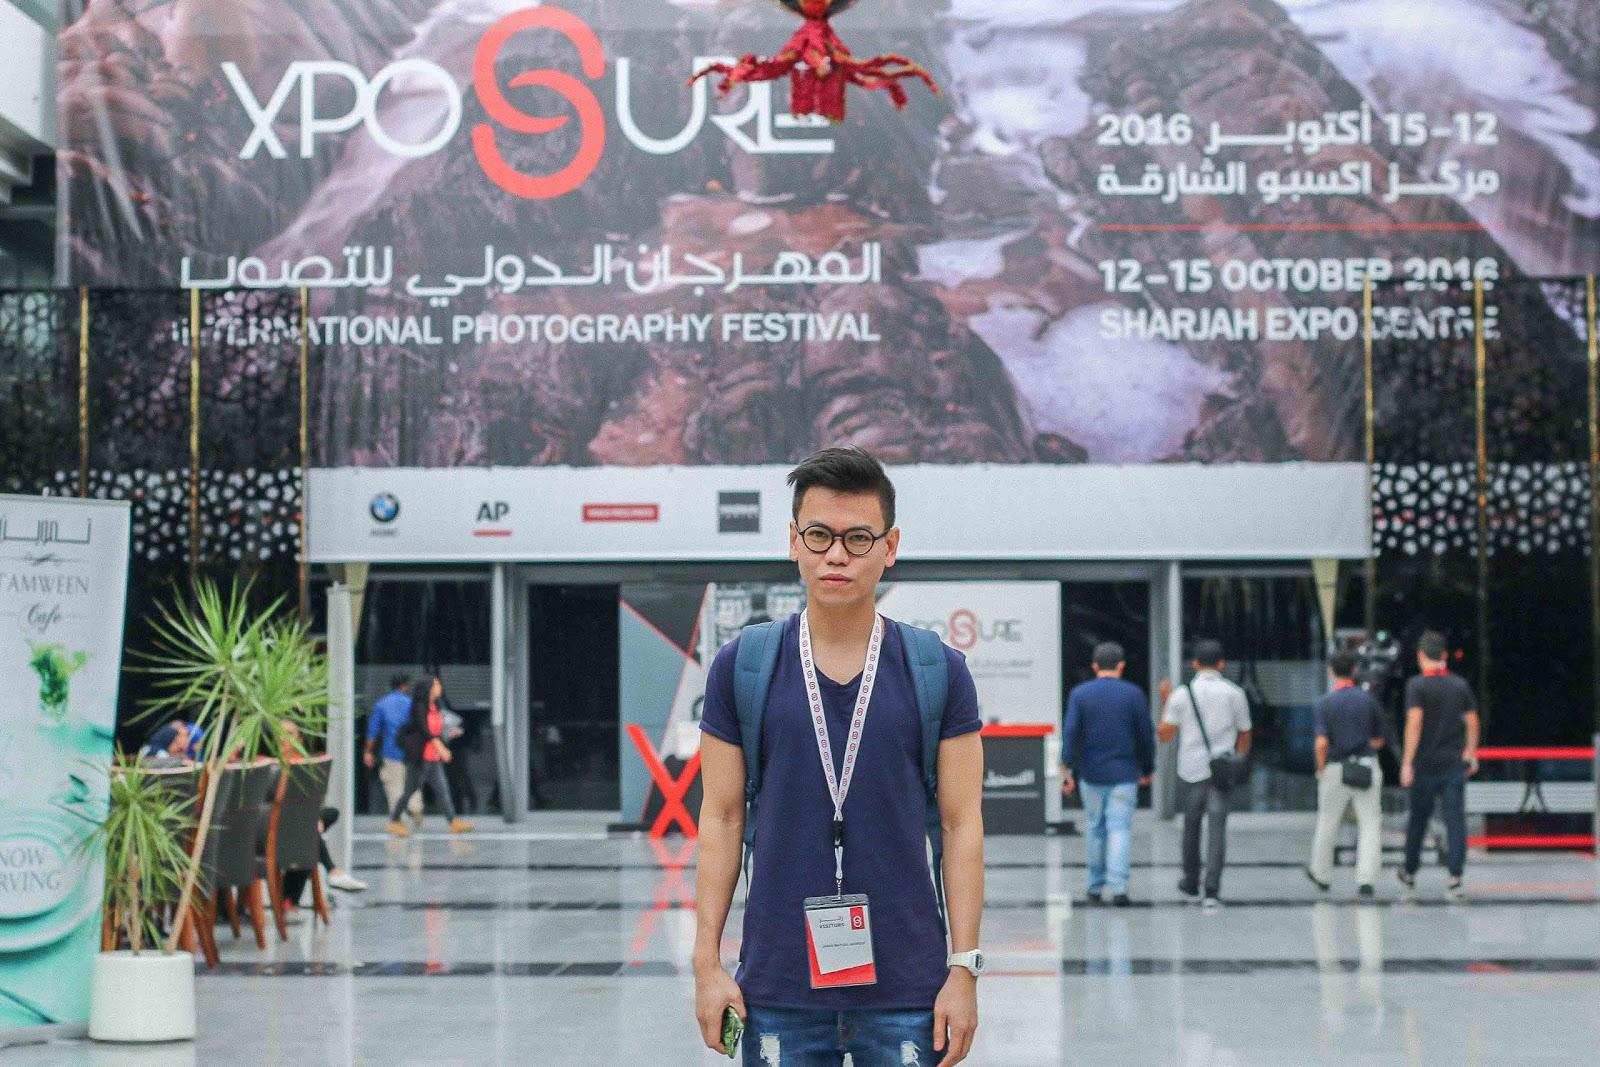 Xposure International Photography Festival event photo